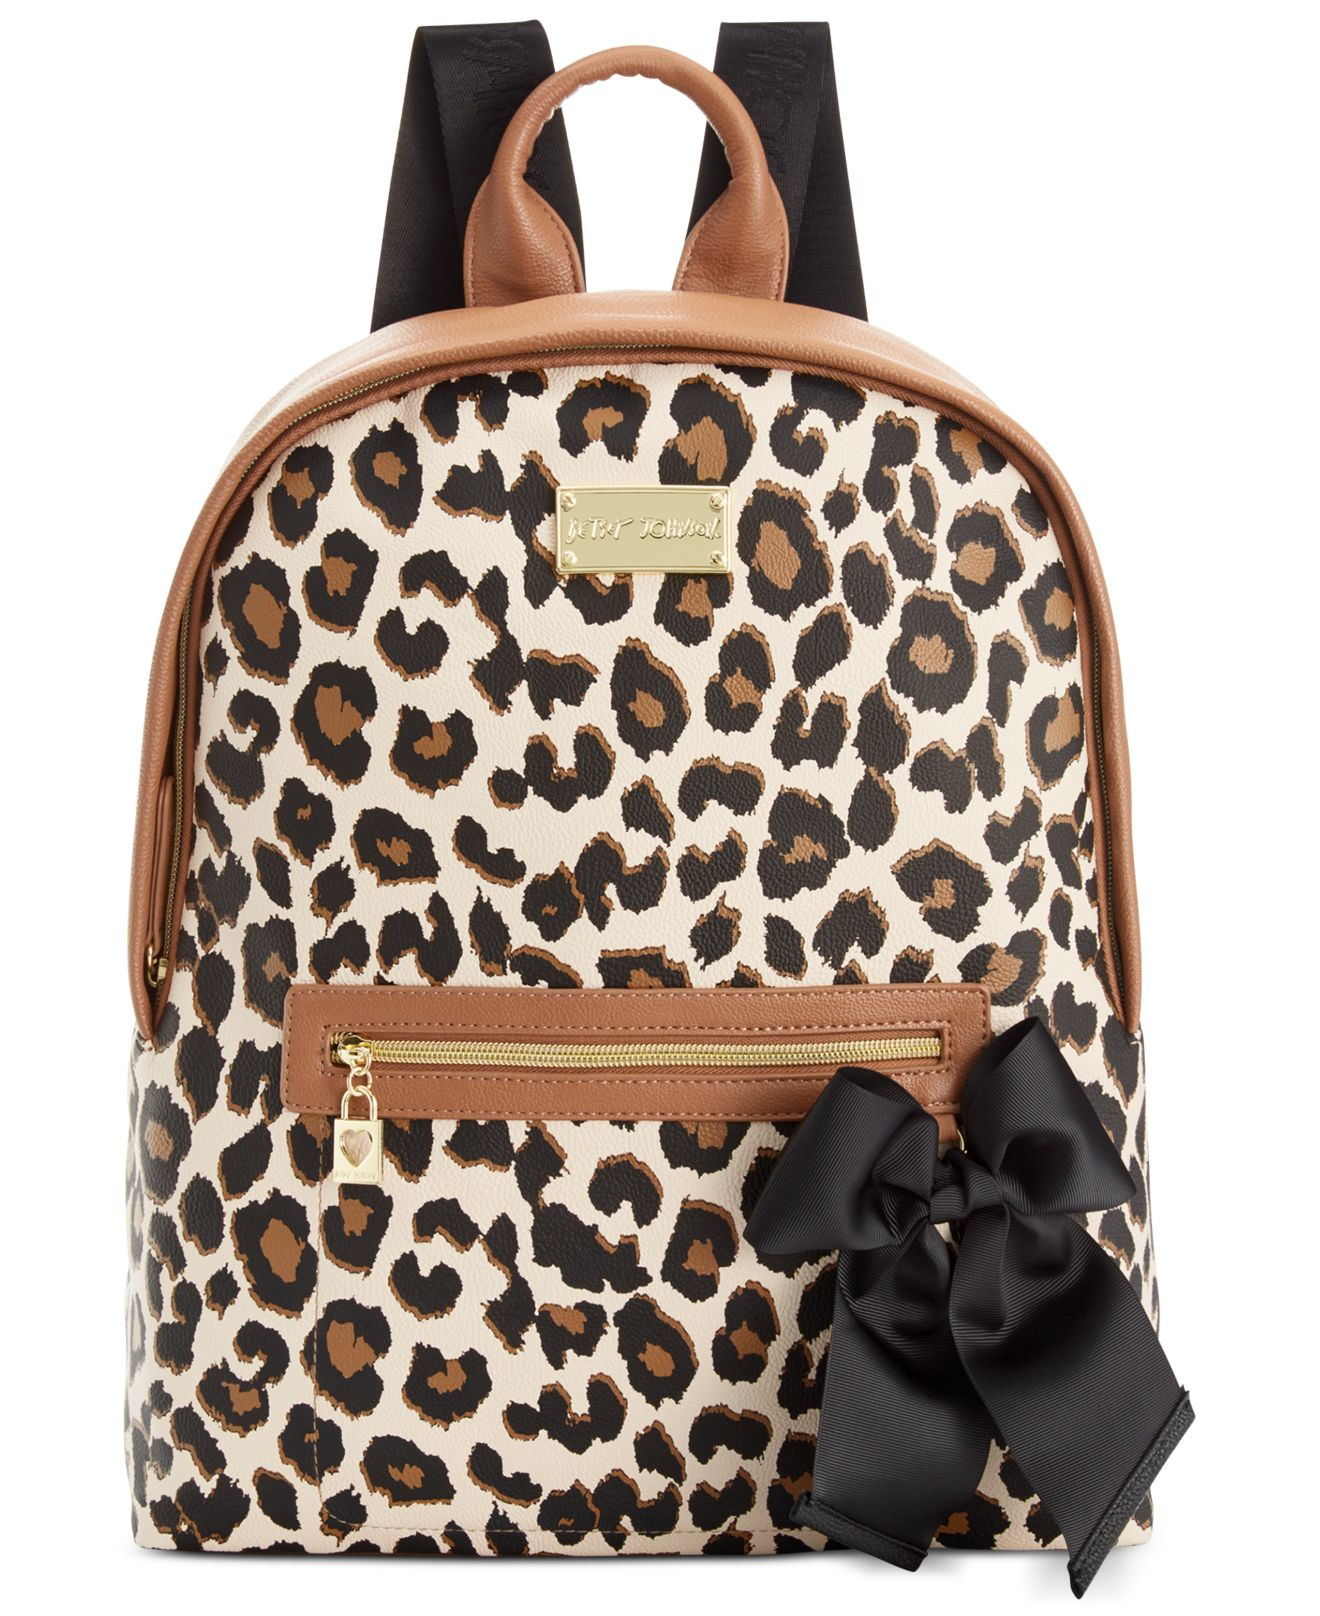 Lyst - Betsey Johnson Macy s Exclusive Leopard Backpack 92470c8d8baa8